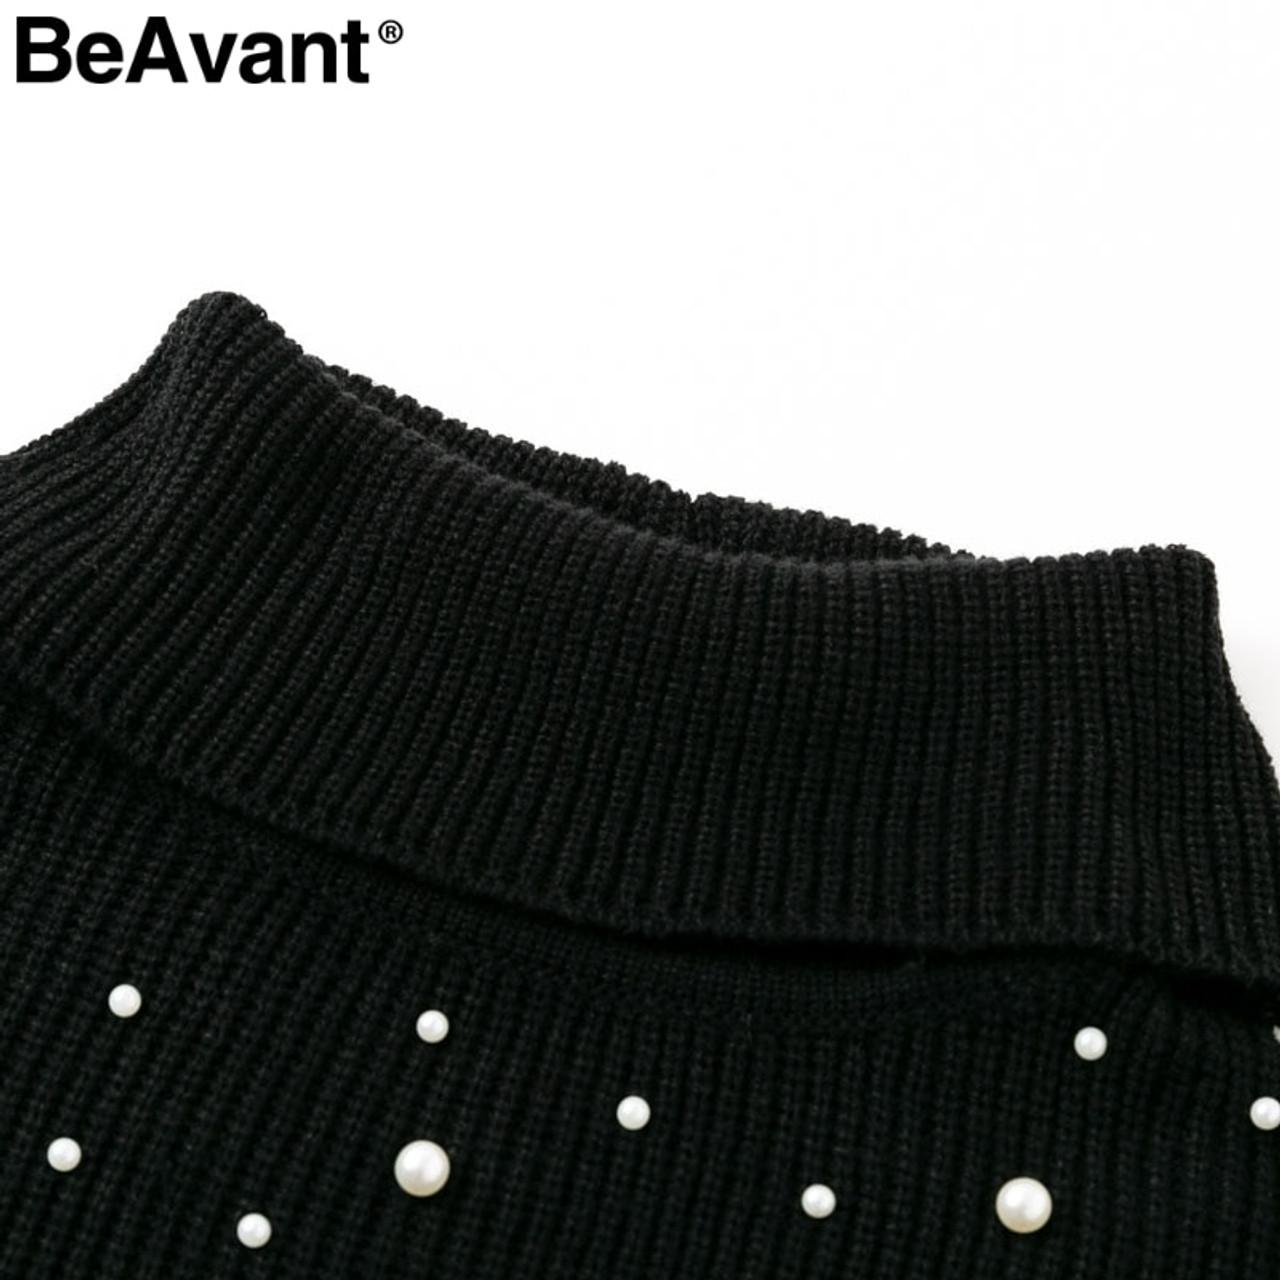 e6963ca8d Turtleneck Knit Sweater Oversize Jumper Sweater Dress in 2018